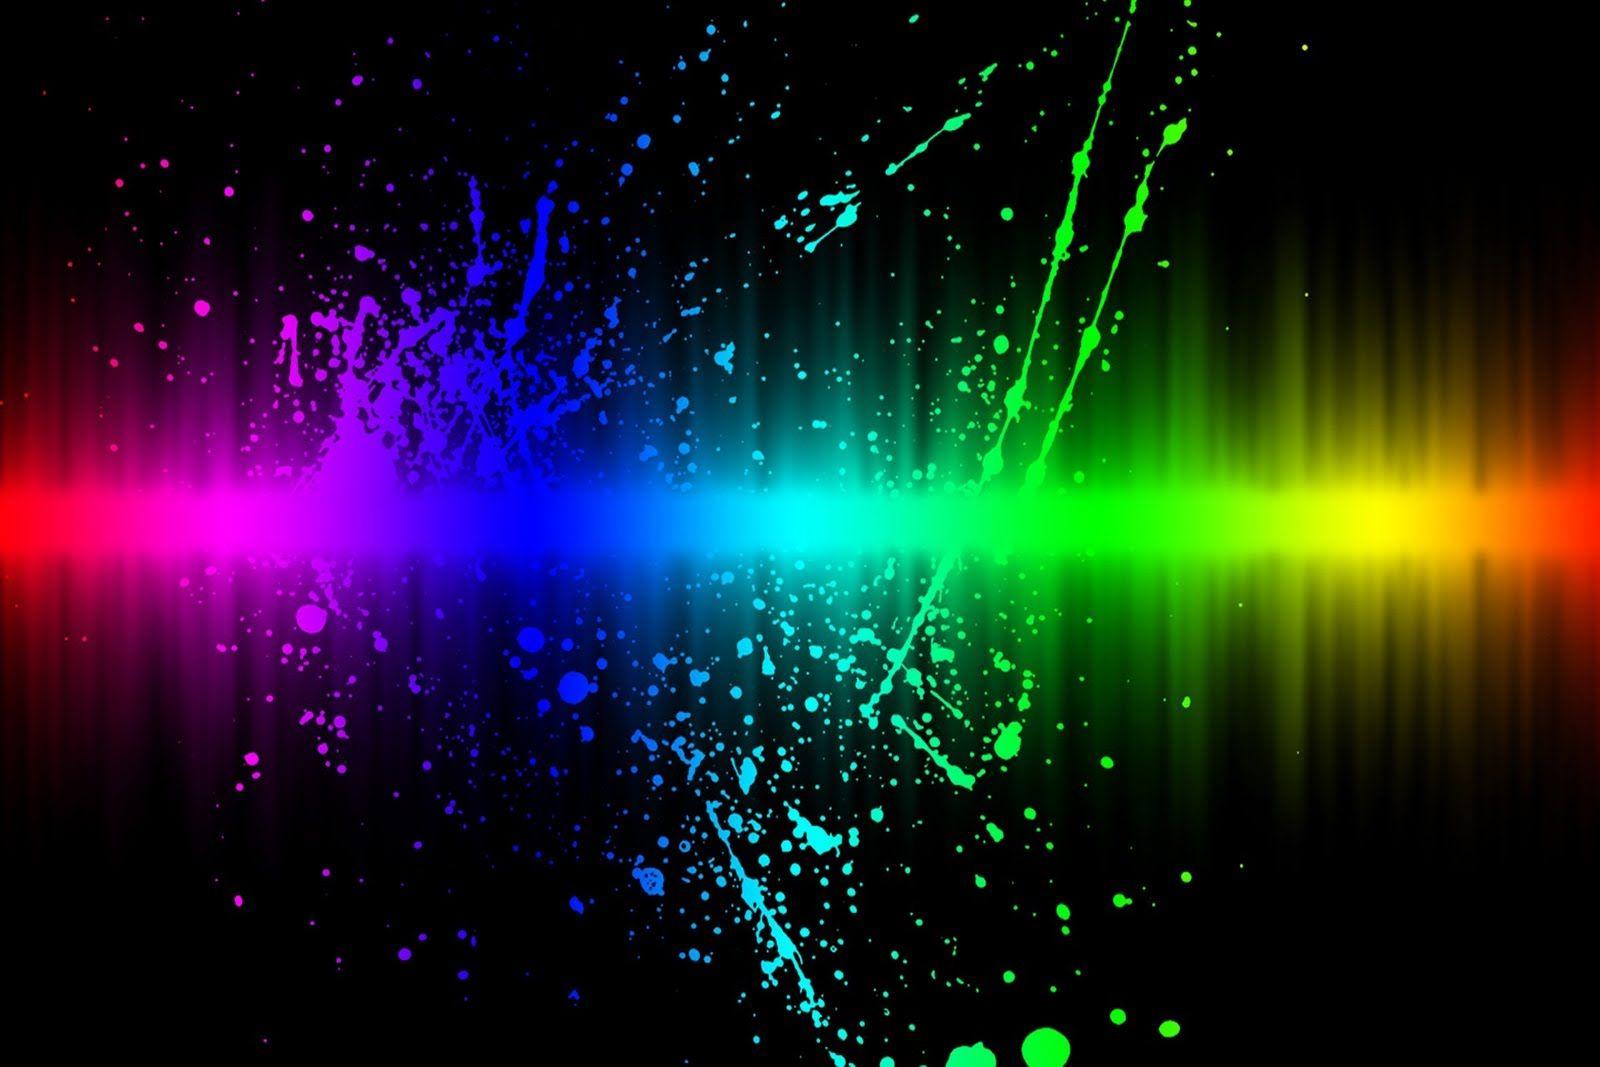 wallpaper: Hd Light Effect Wallpaper | Epic Car Wallpapers | Desktop background pictures ...